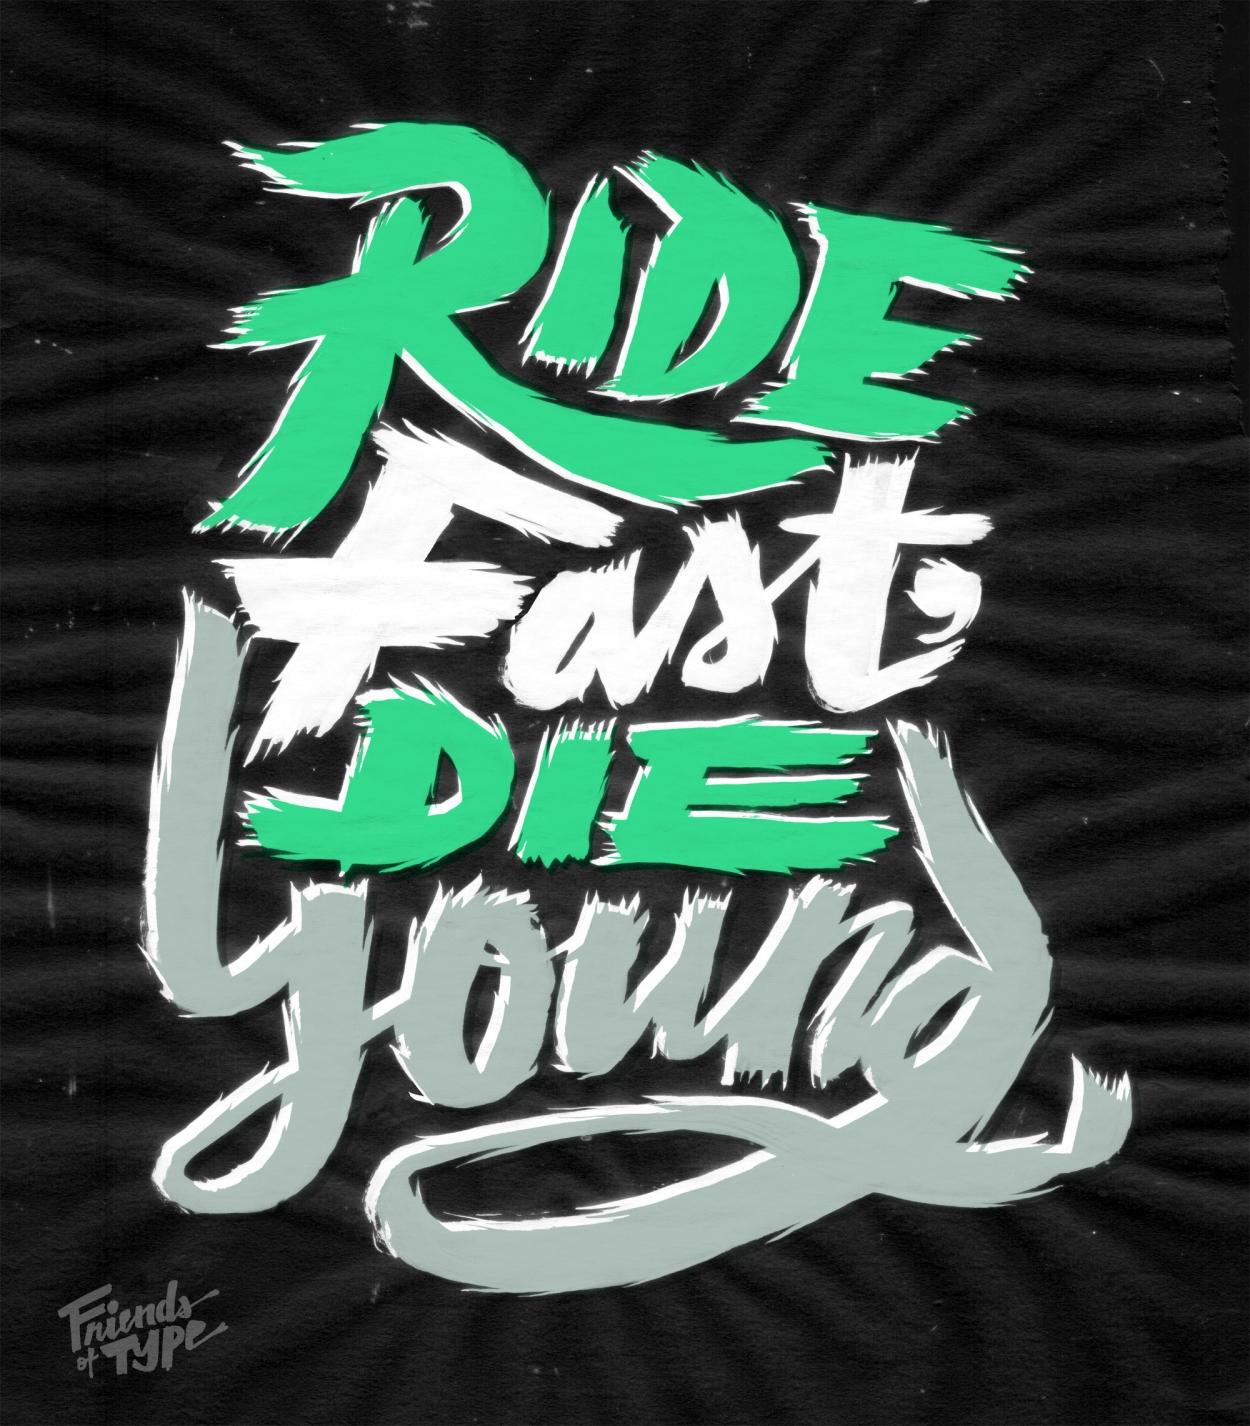 Erik Marinovich - Friends of Type - Ride Fast, Die Young